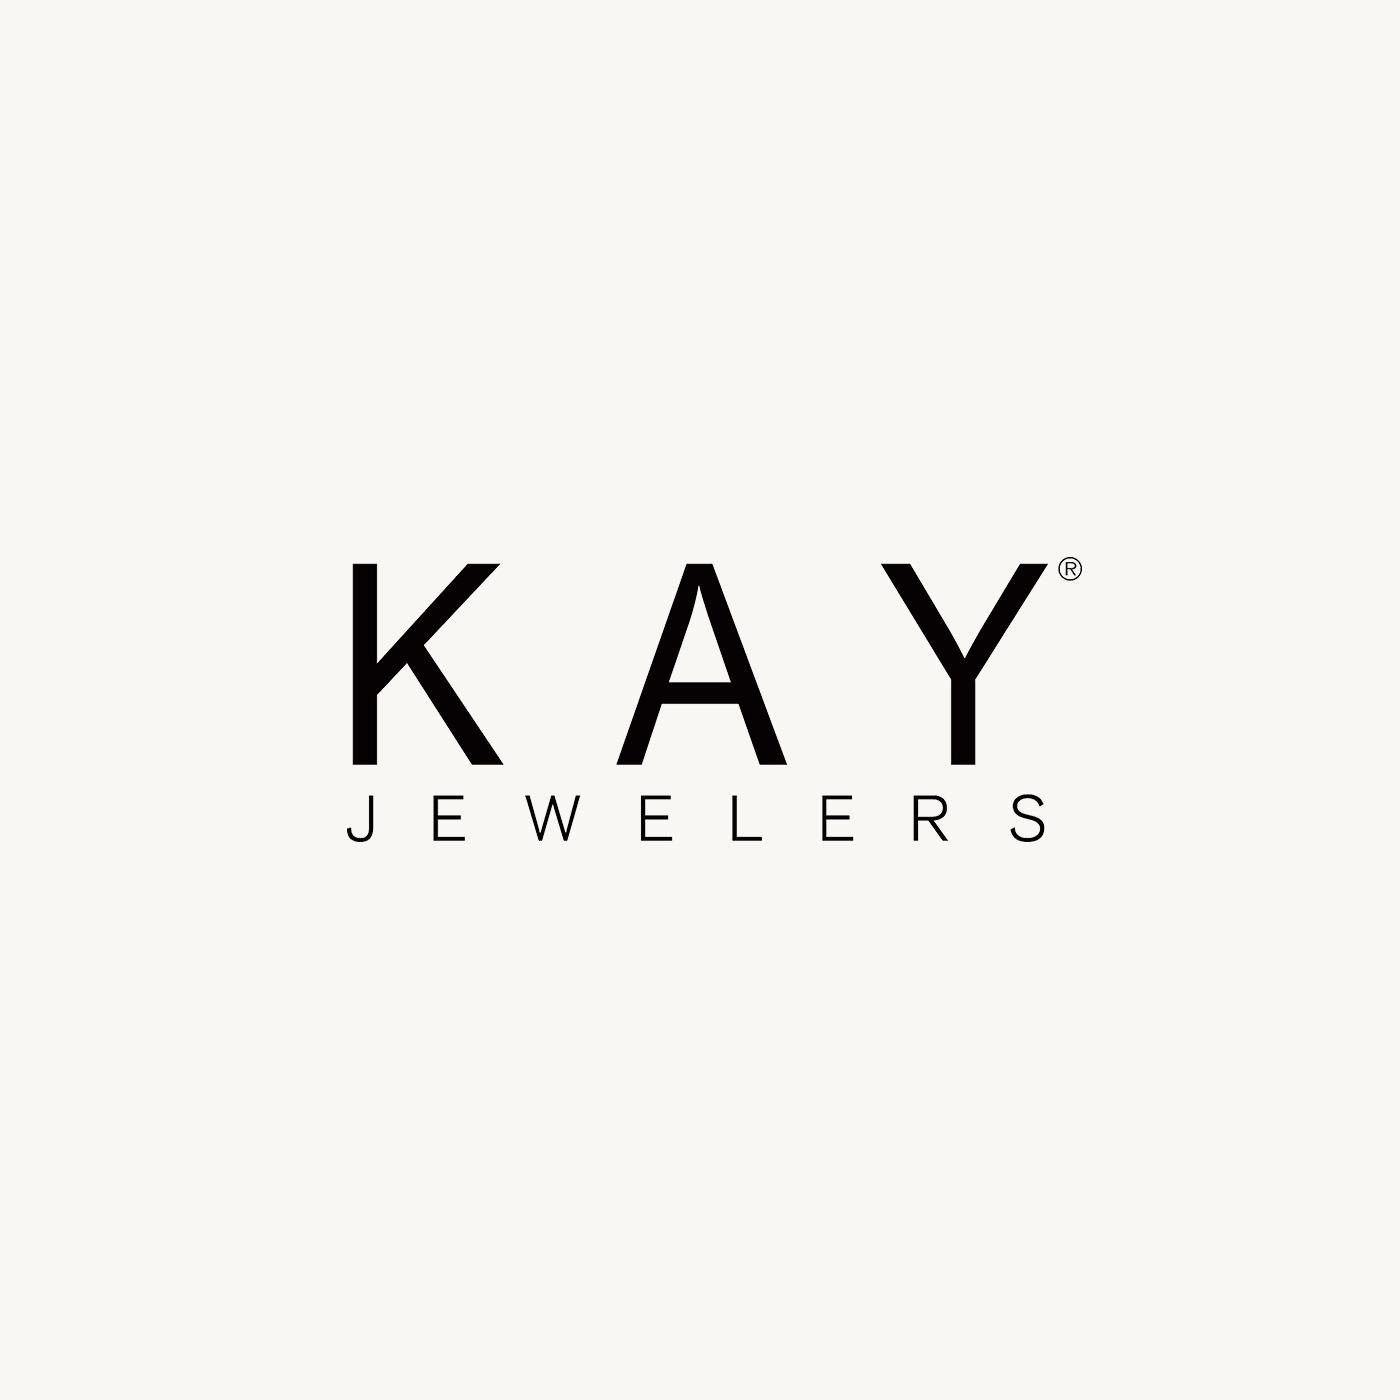 Kay Jewelers Logo.jpg